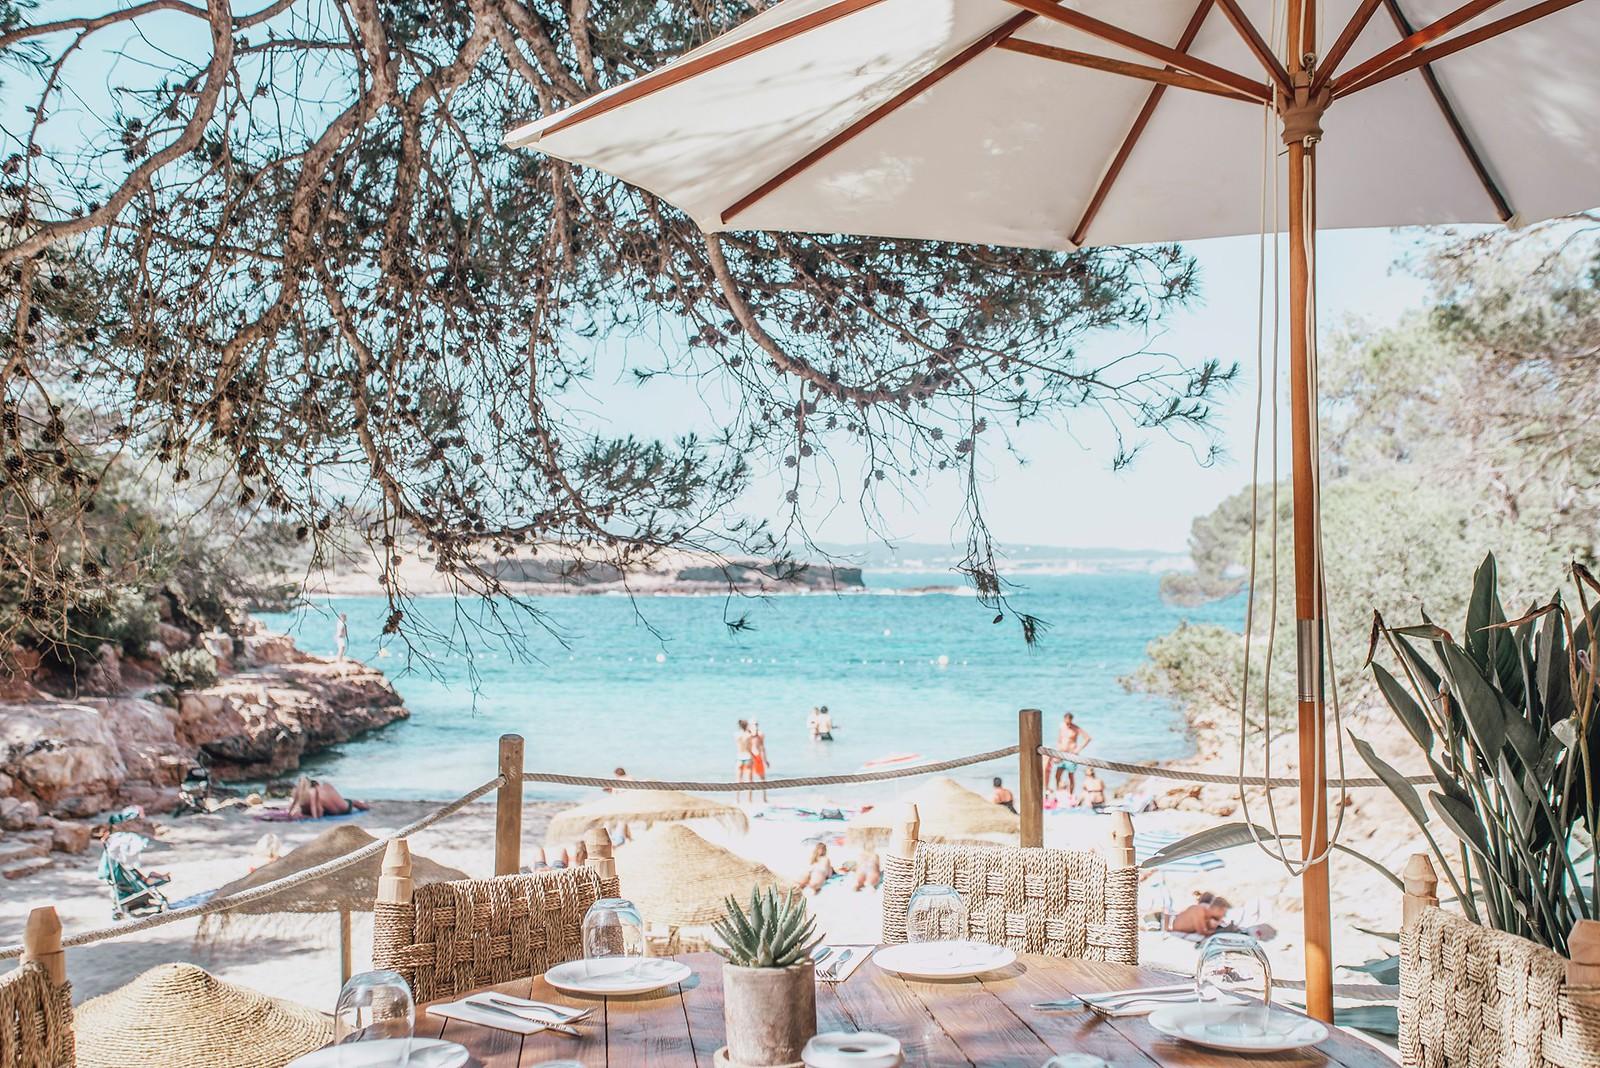 https://www.white-ibiza.com/wp-content/uploads/2020/09/white-ibiza-beach-restaurants-cala-gracioneta-chiringuito-03.jpg